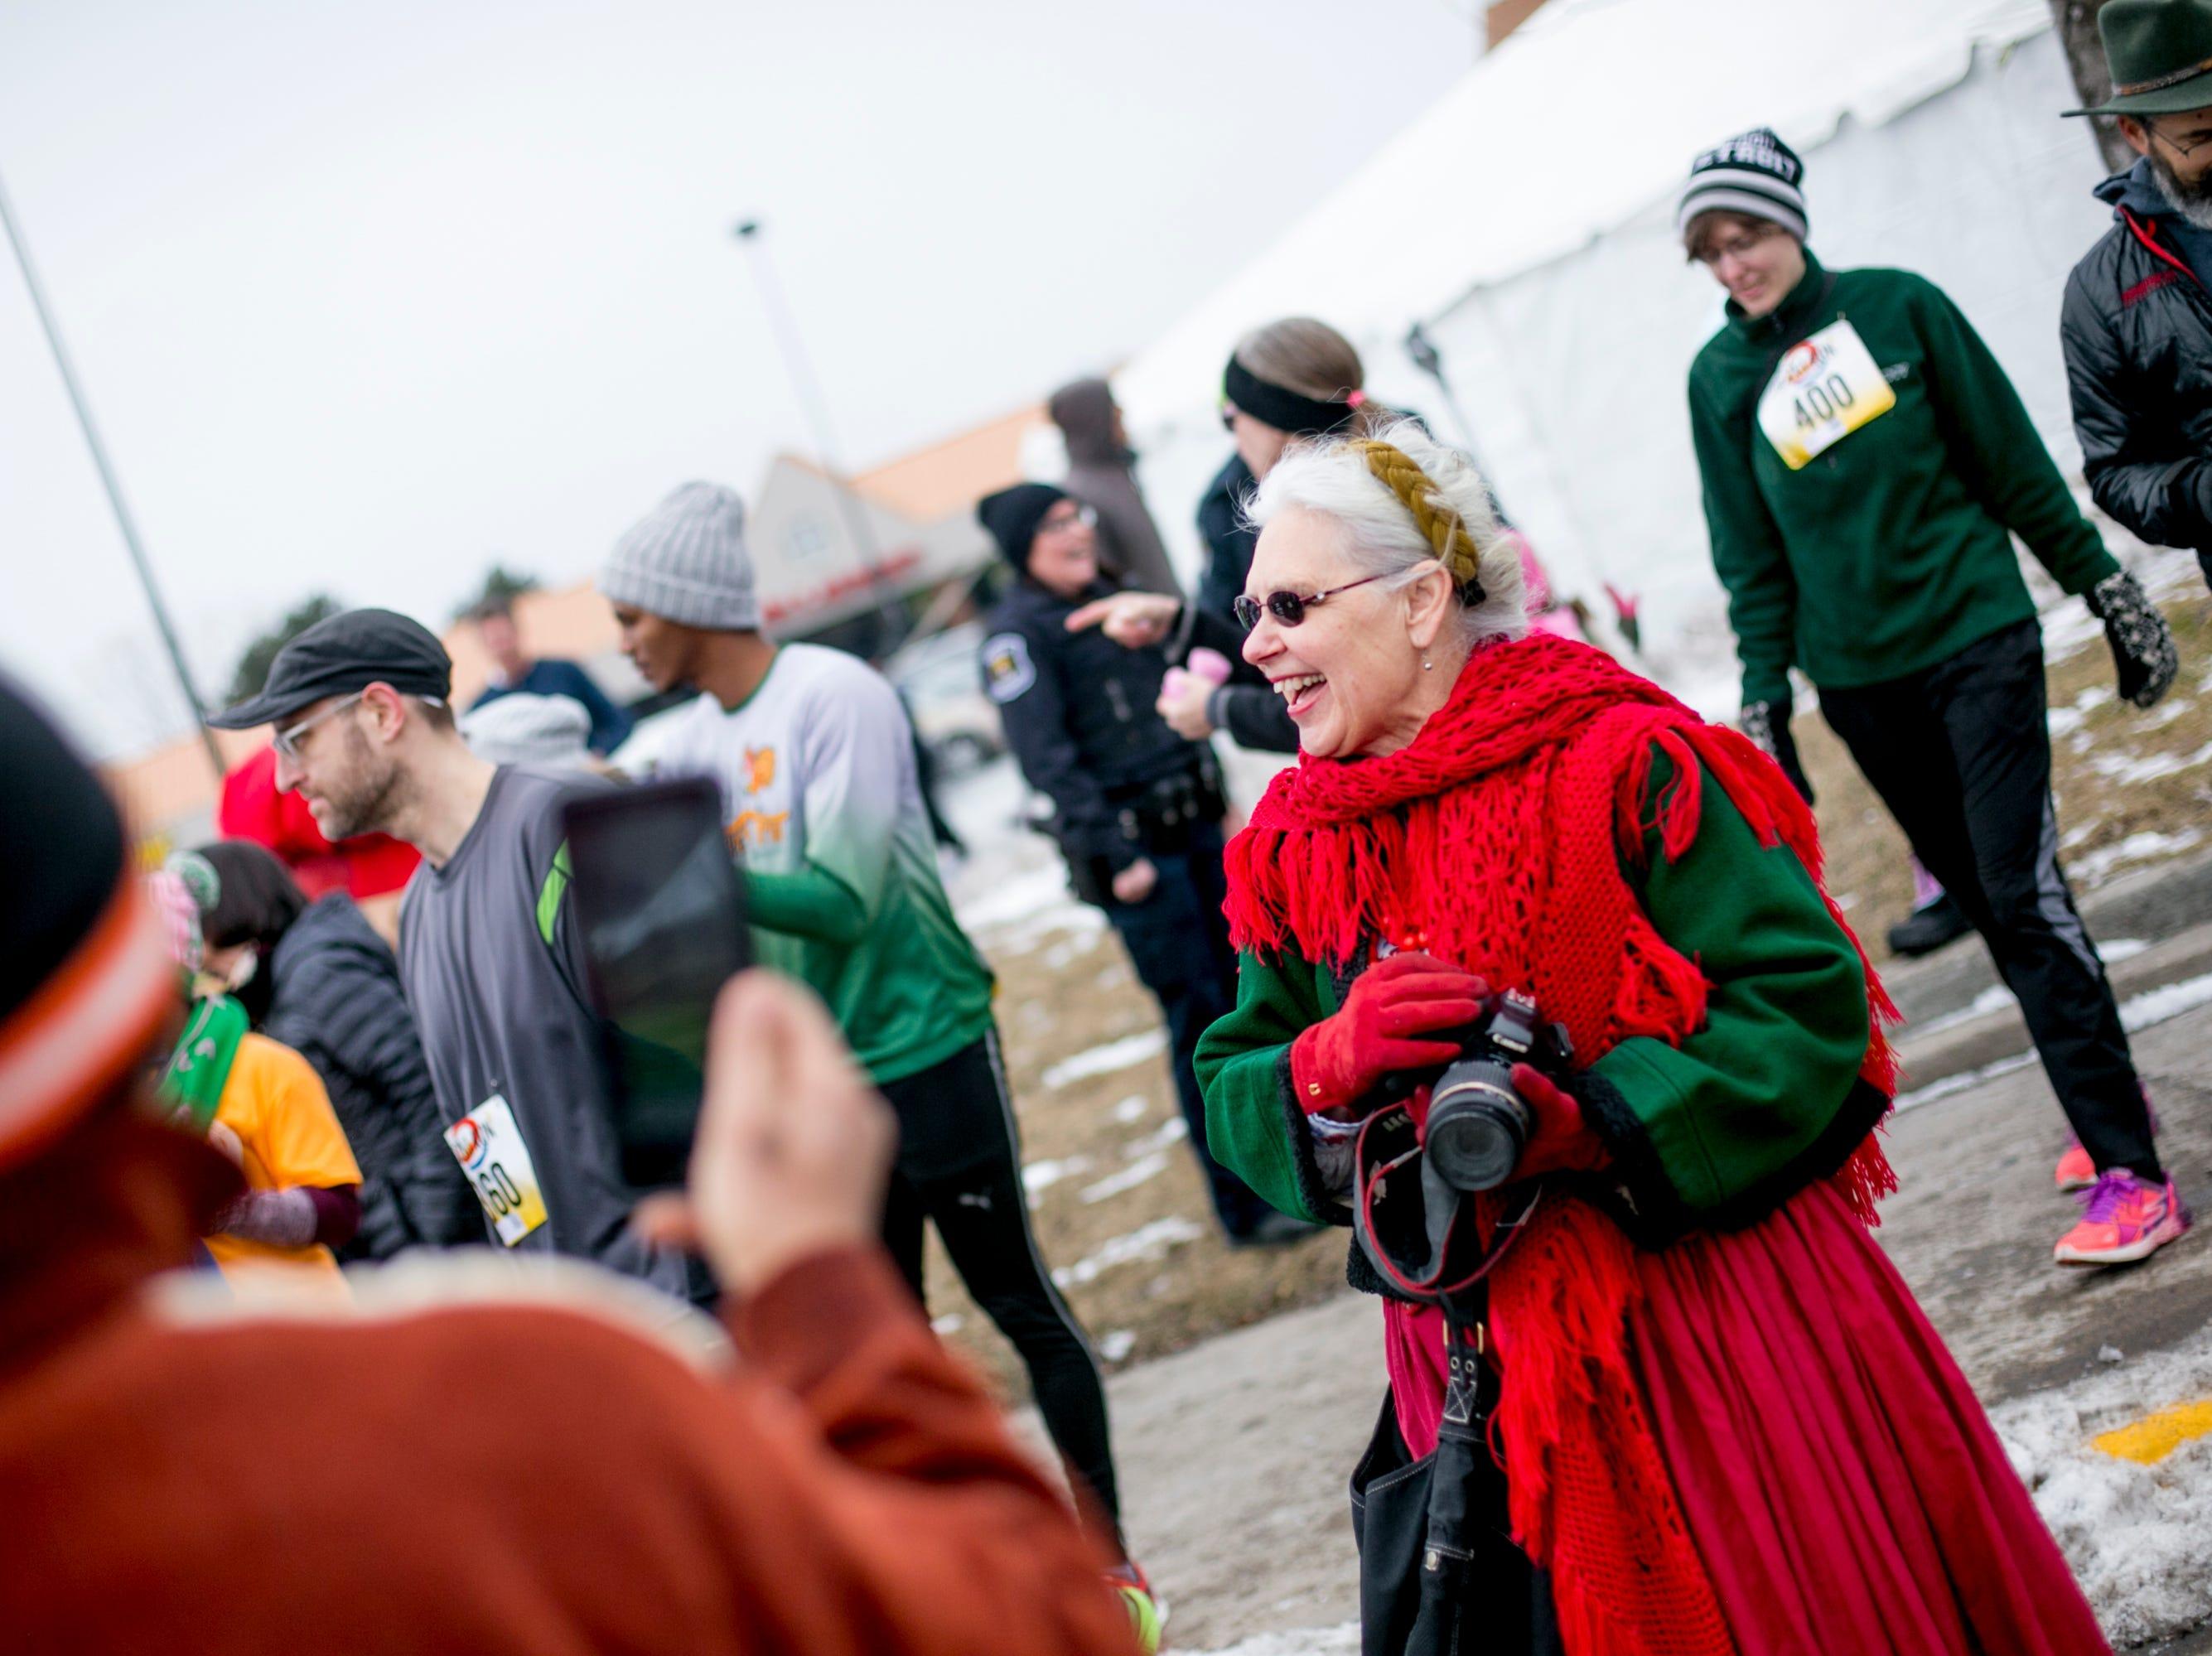 Hamtramck Mayor Karen Majewski attends the 7th annual Tour-de-Troit Paczki Run.